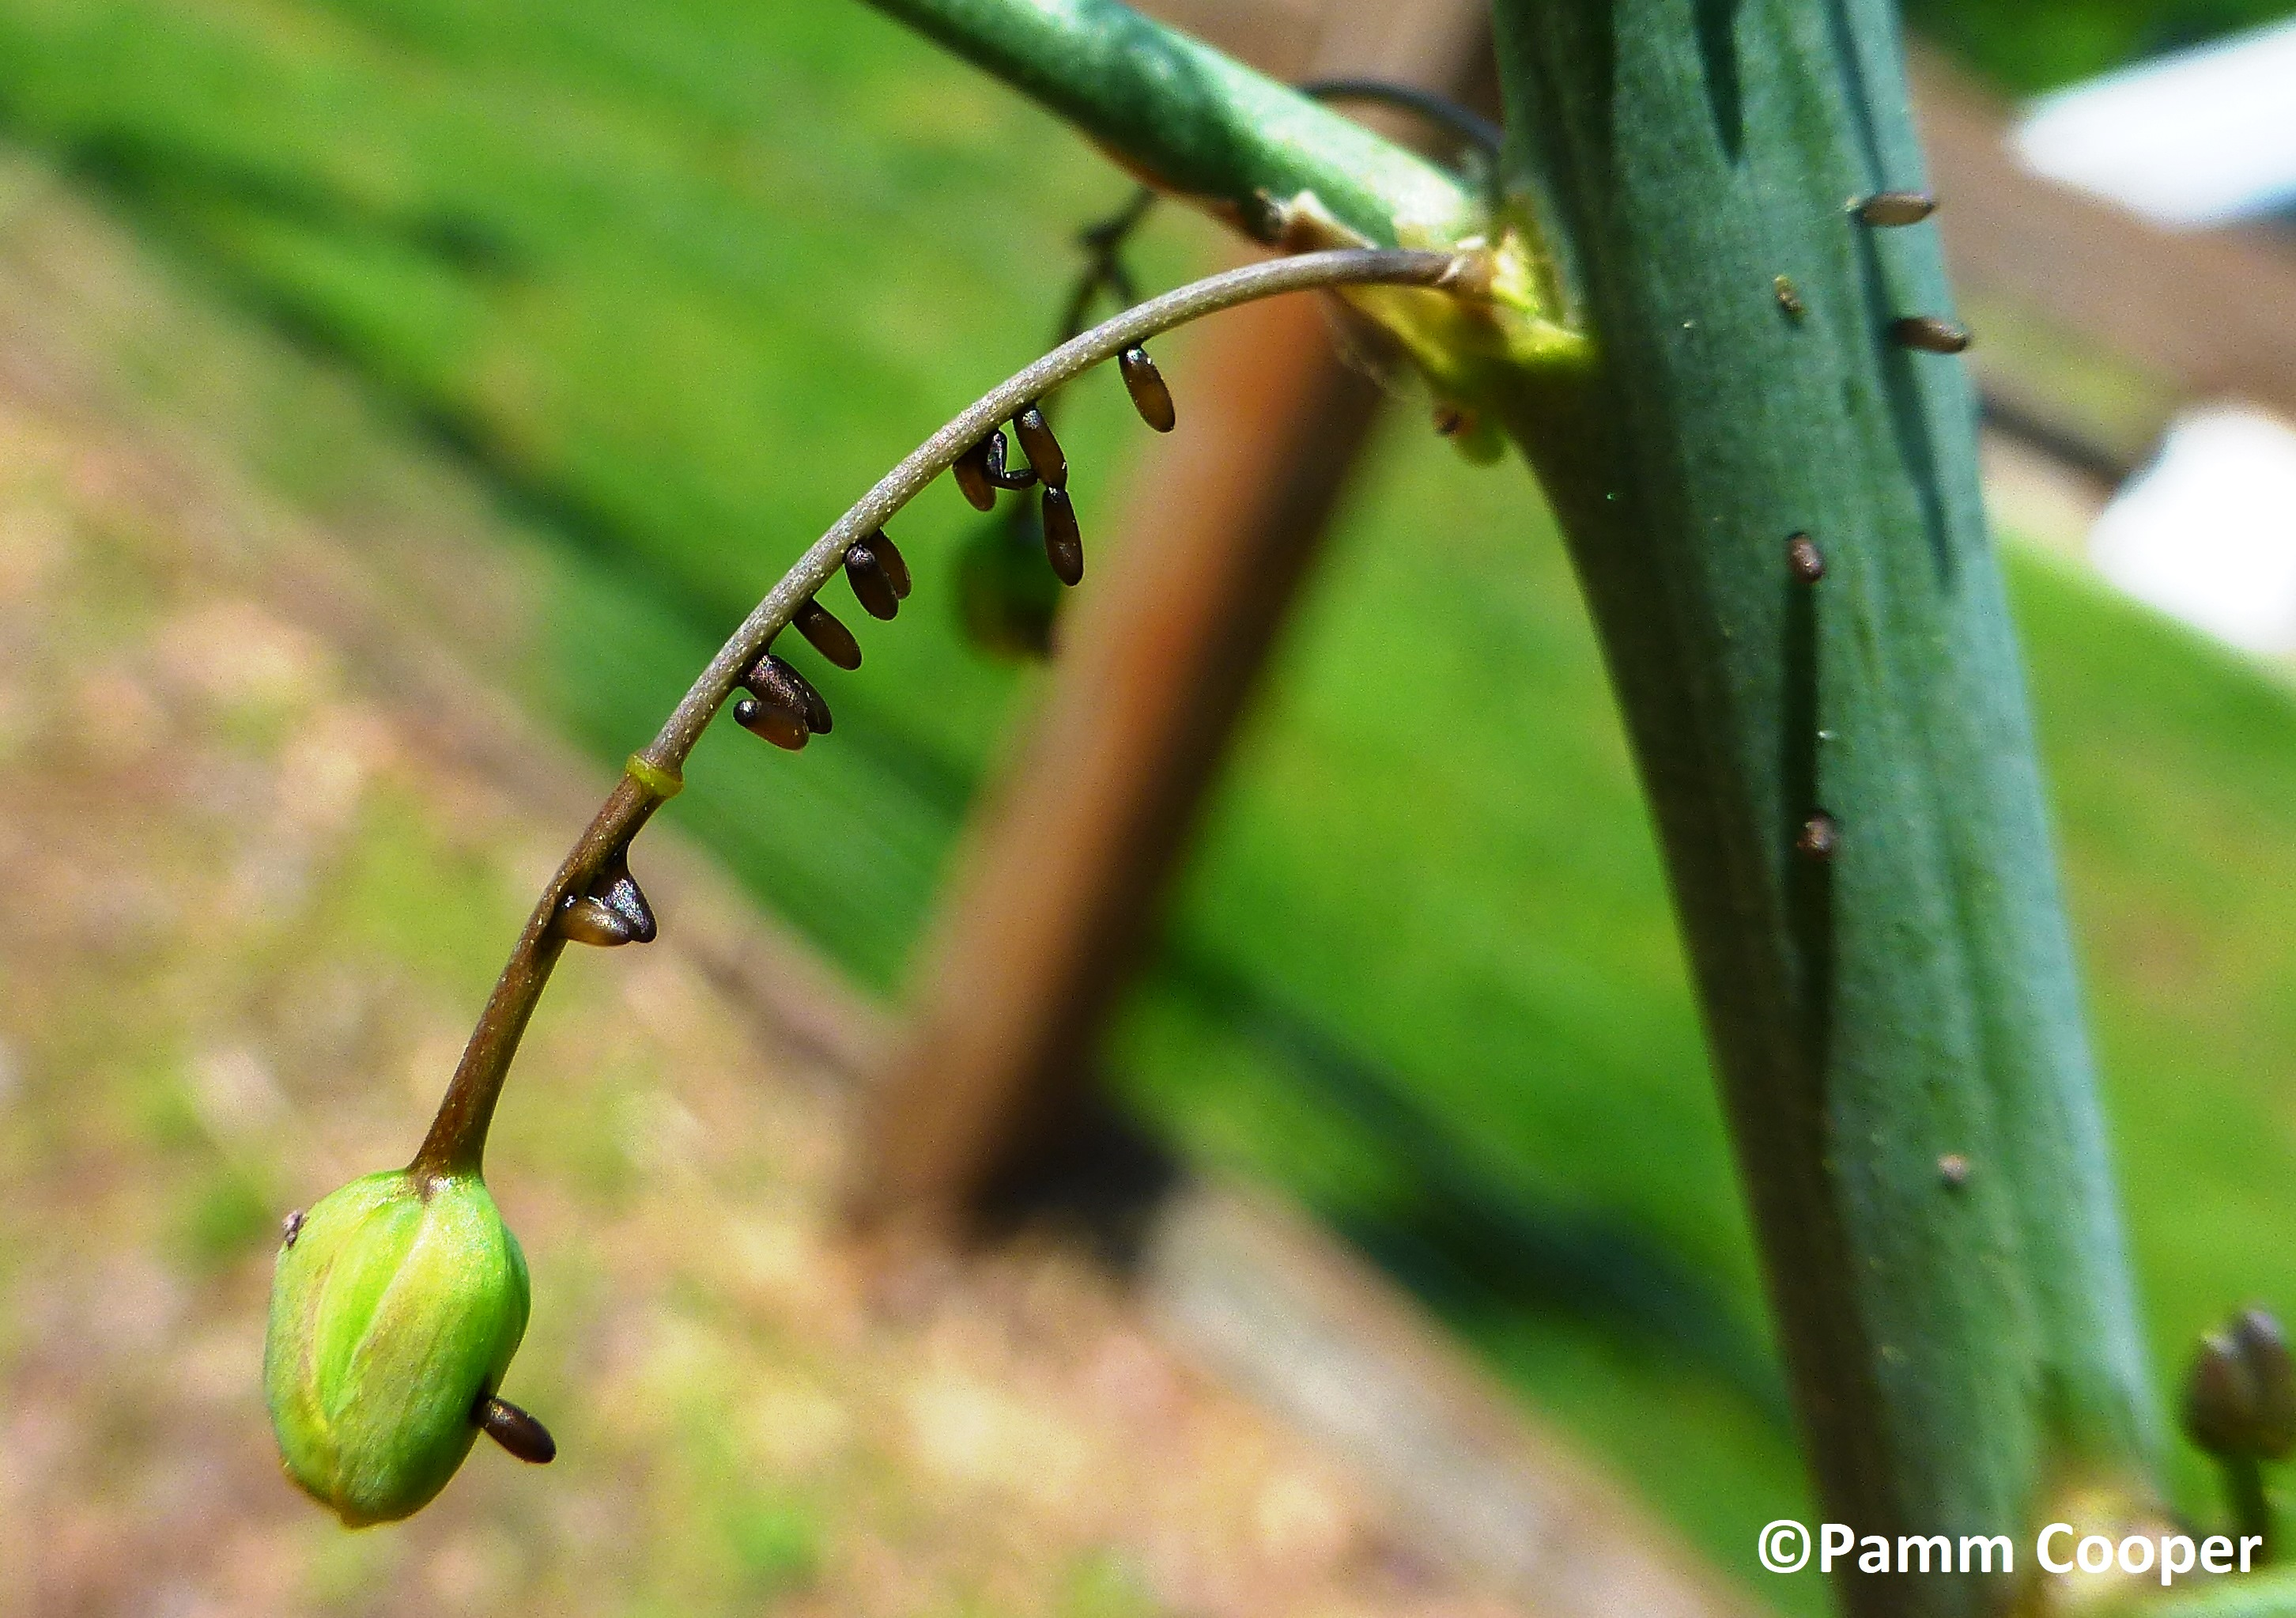 asparagus beetle eggs May 20 2019